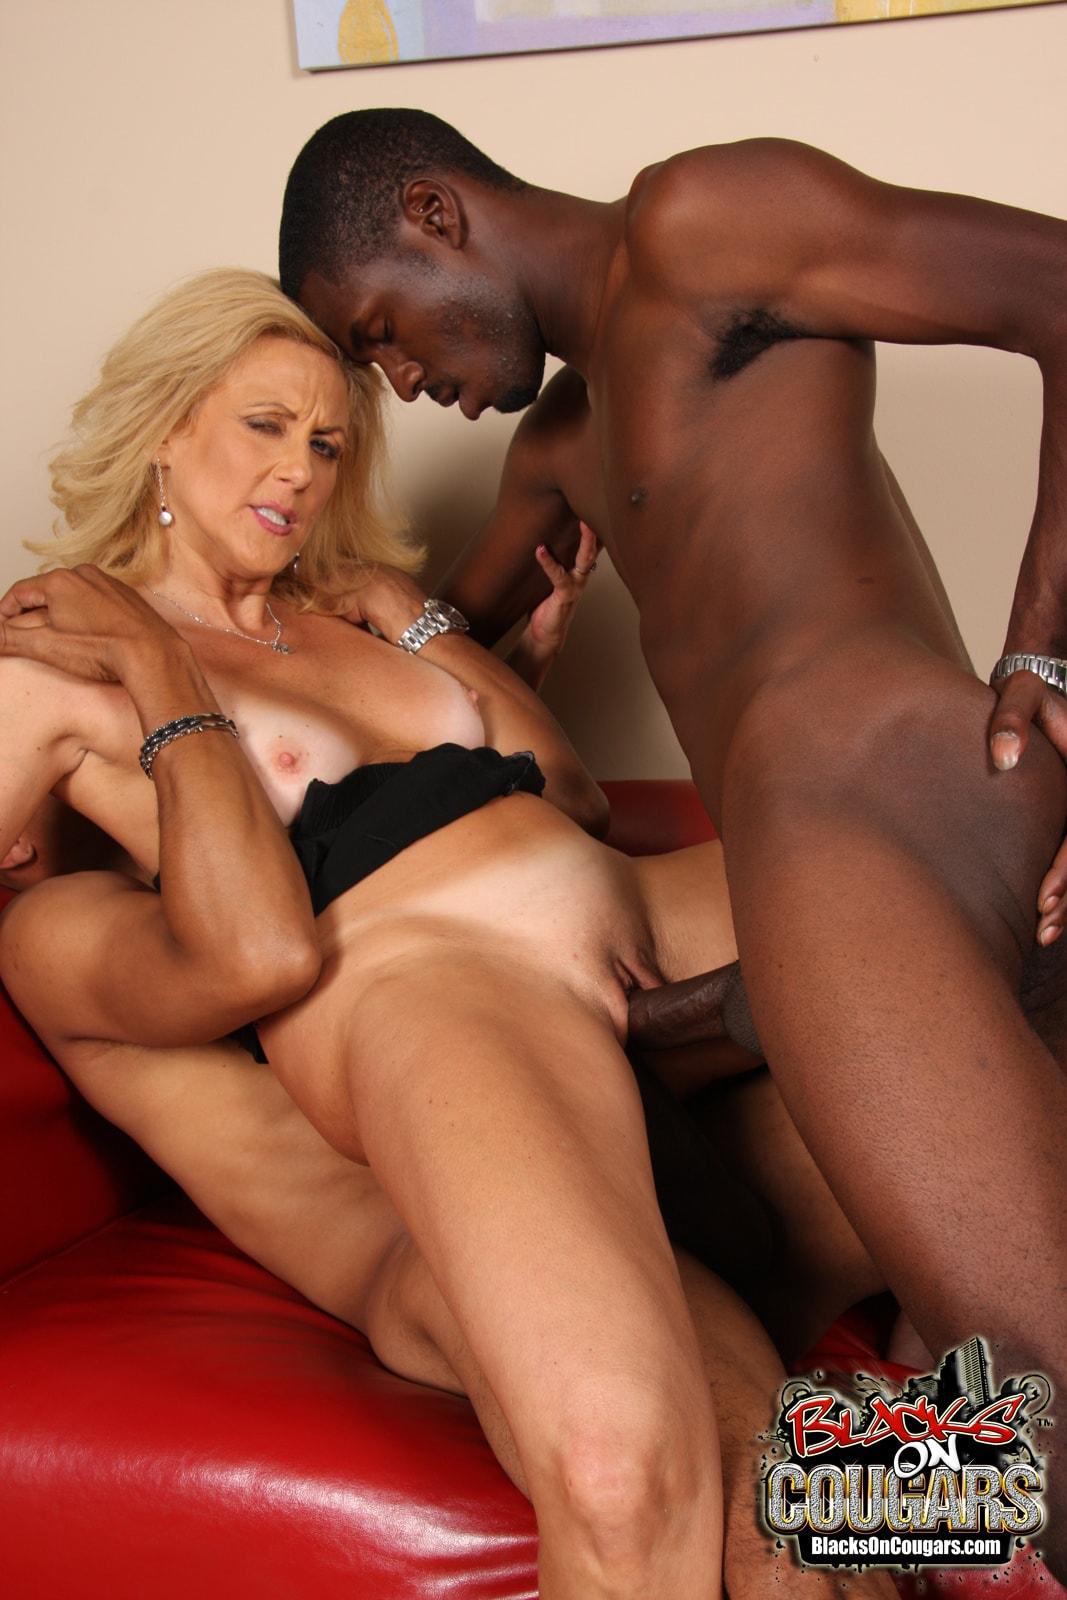 Секс фото со зрелыми негритянками 6 фотография